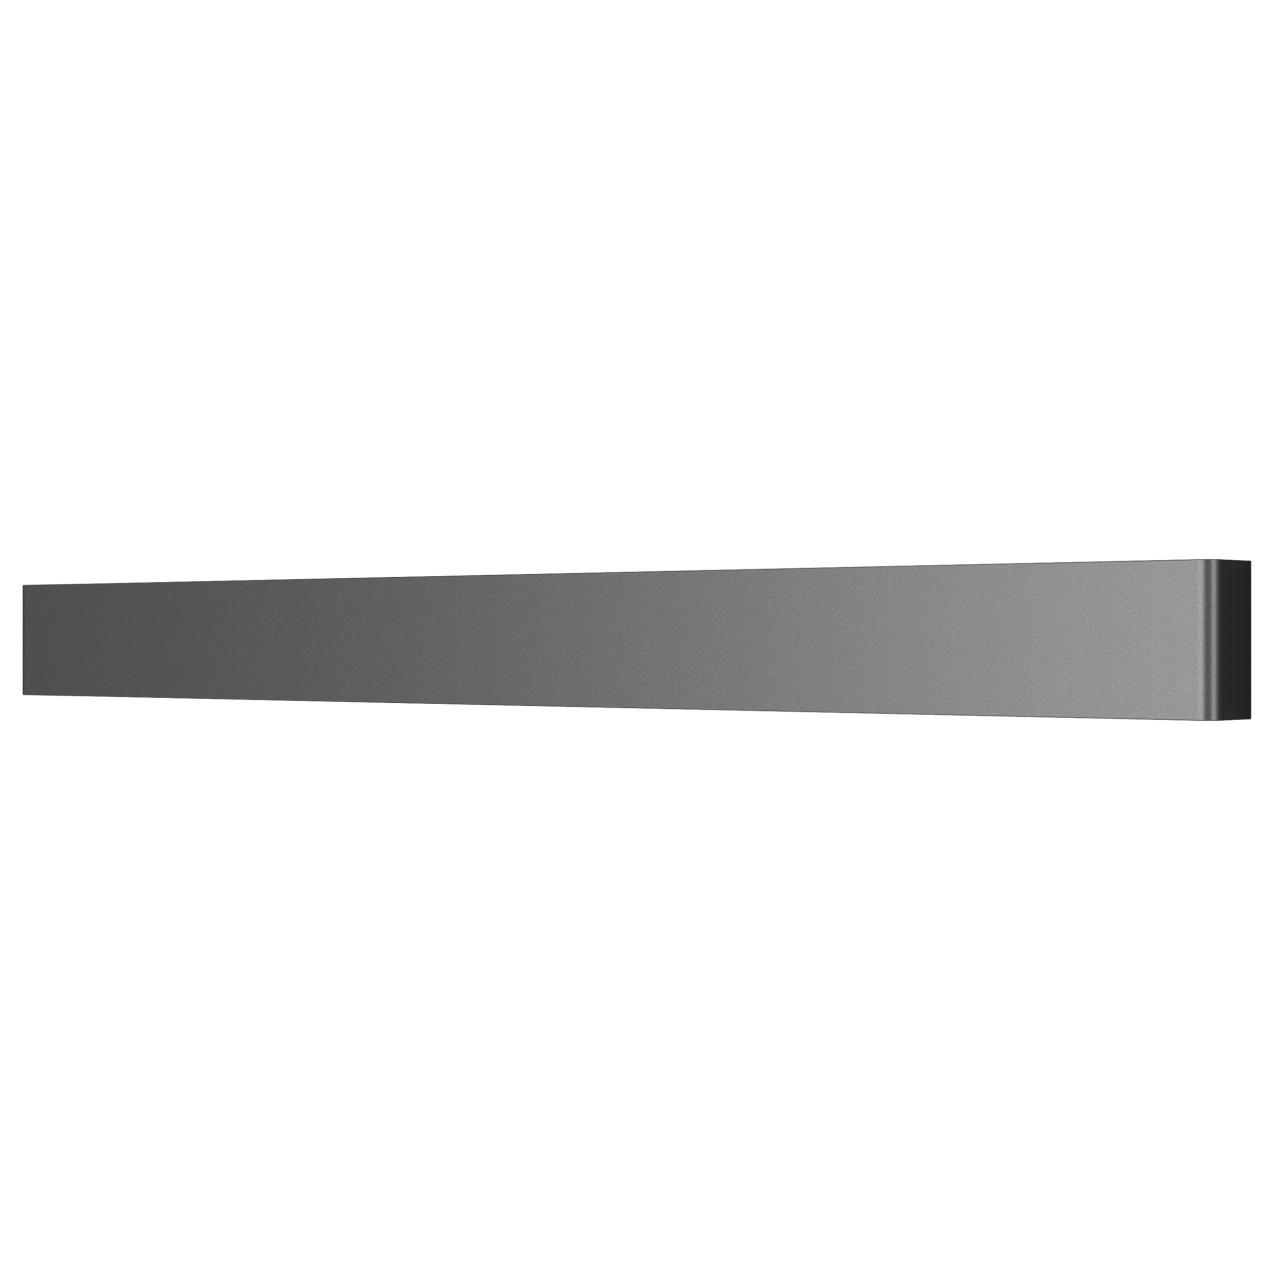 Бра Fiume 30W 2850LM матовый черный 3000K Lightstar 810537